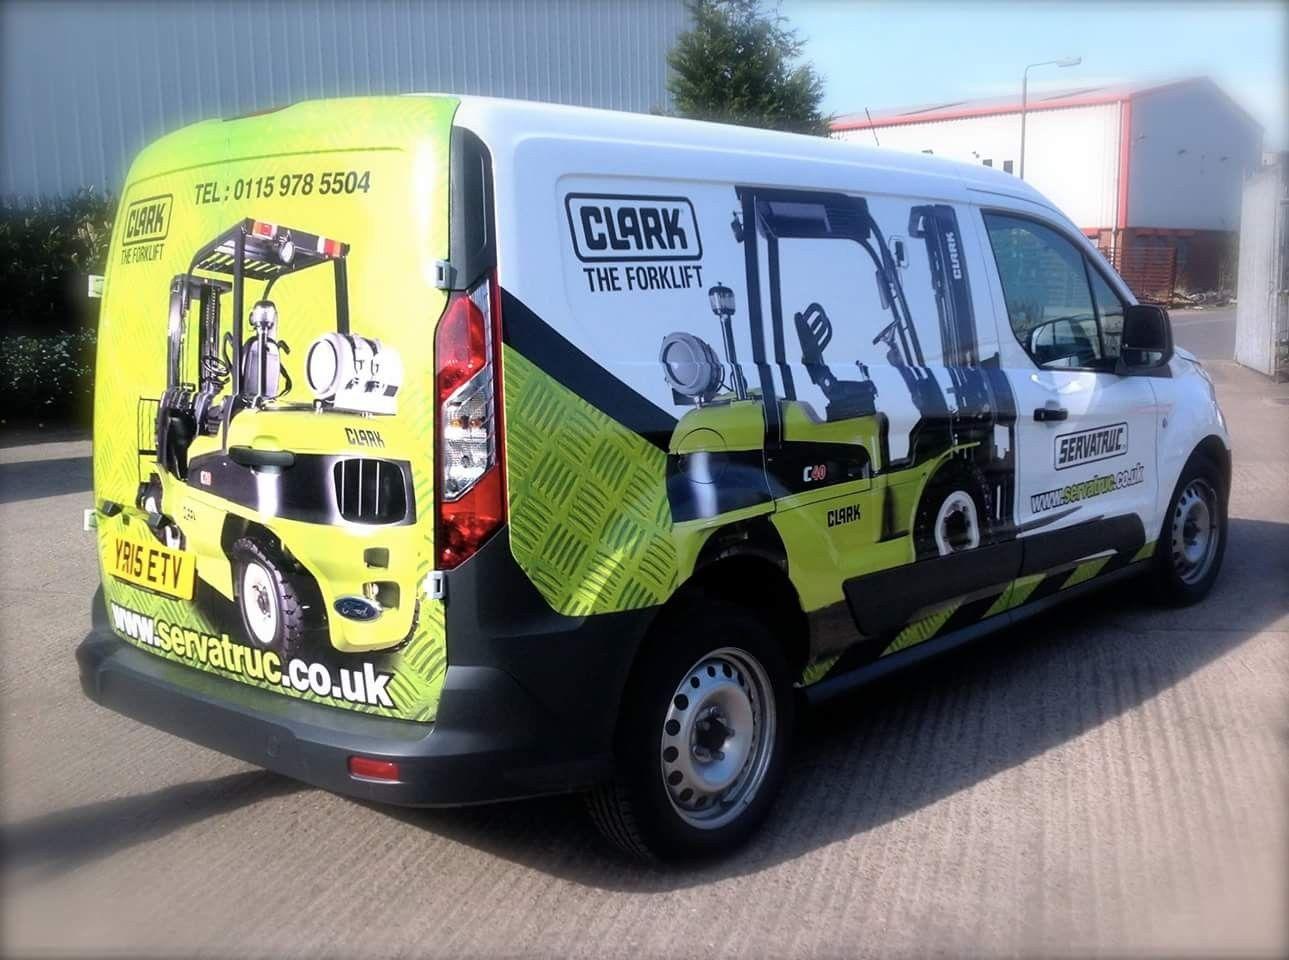 Van Advertisimg Forklift Services